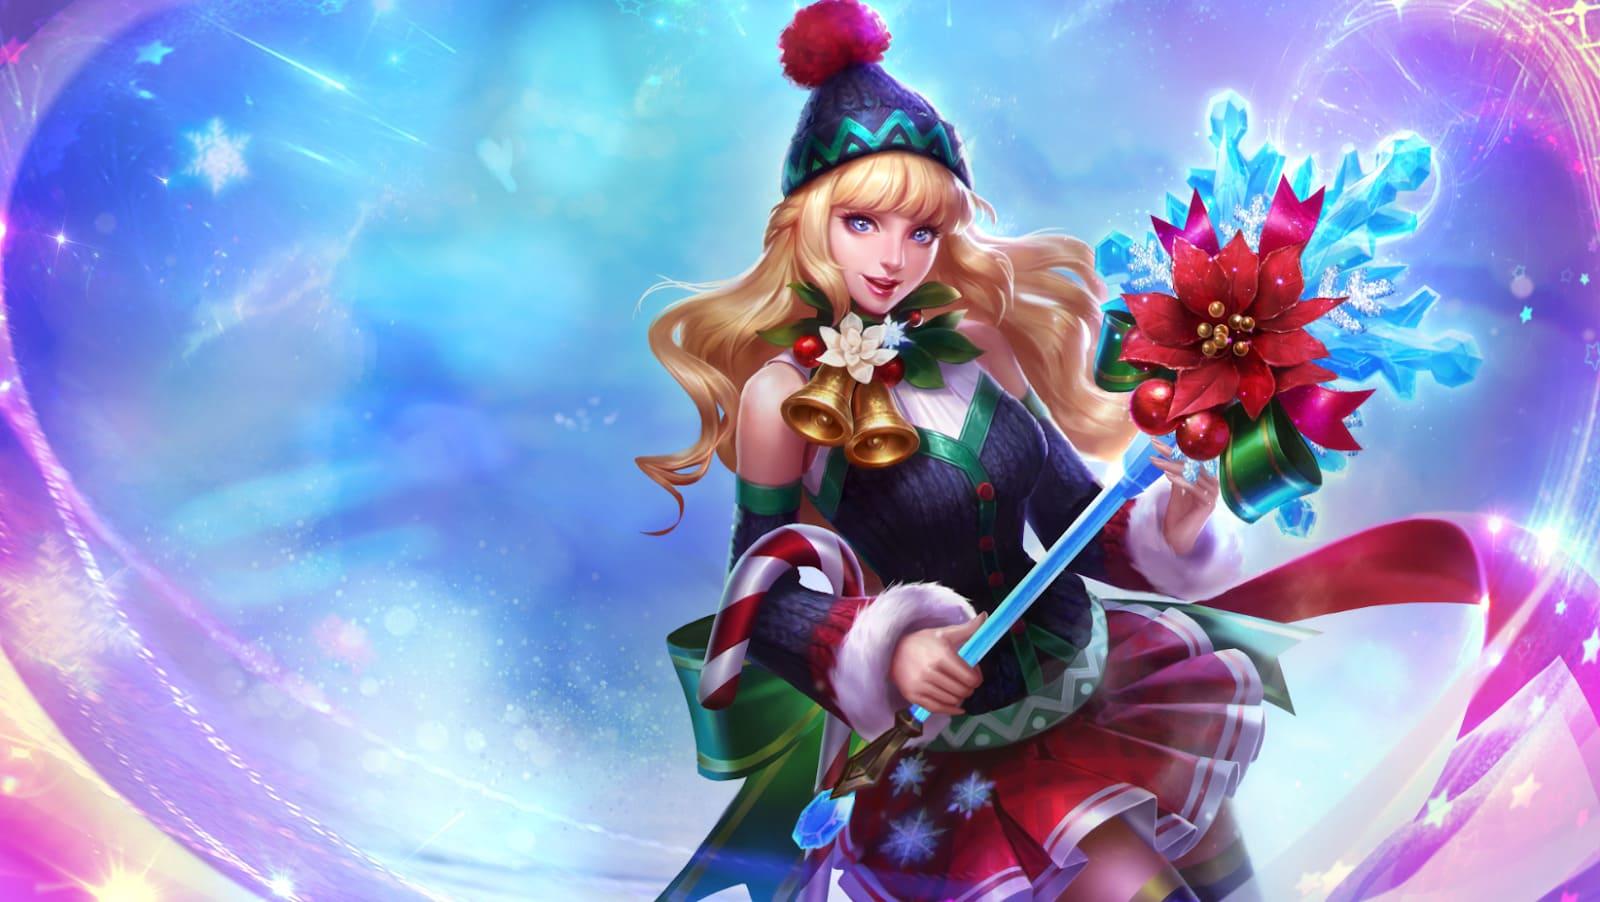 Wallpaper Odette Christmas Carnival Skin Mobile Legends HD for PC